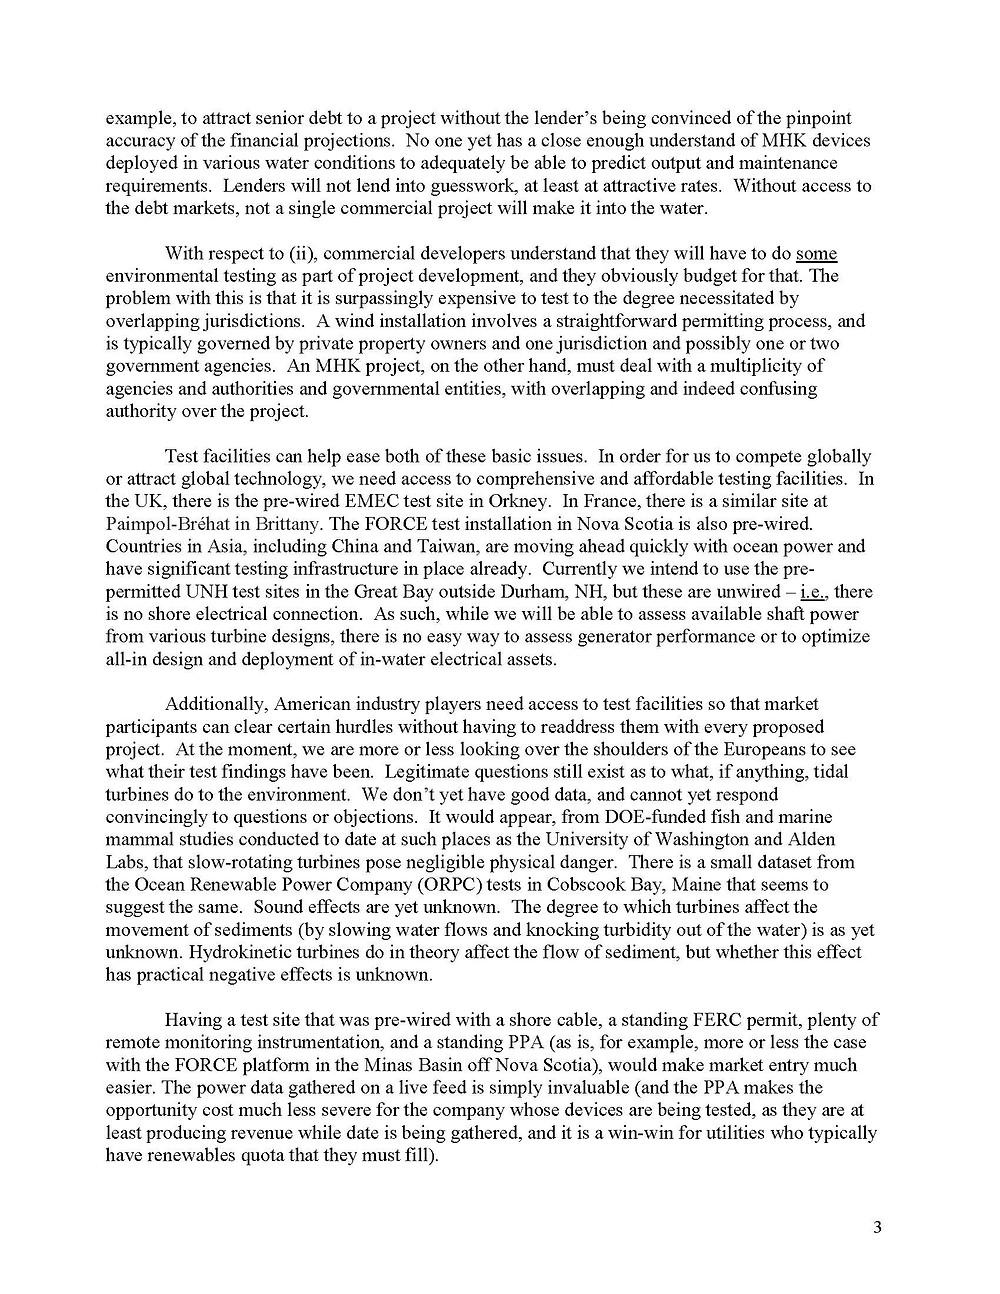 Memo to DOE - Program Strategy to Advance MHK 3-20-15_Page_3.jpg